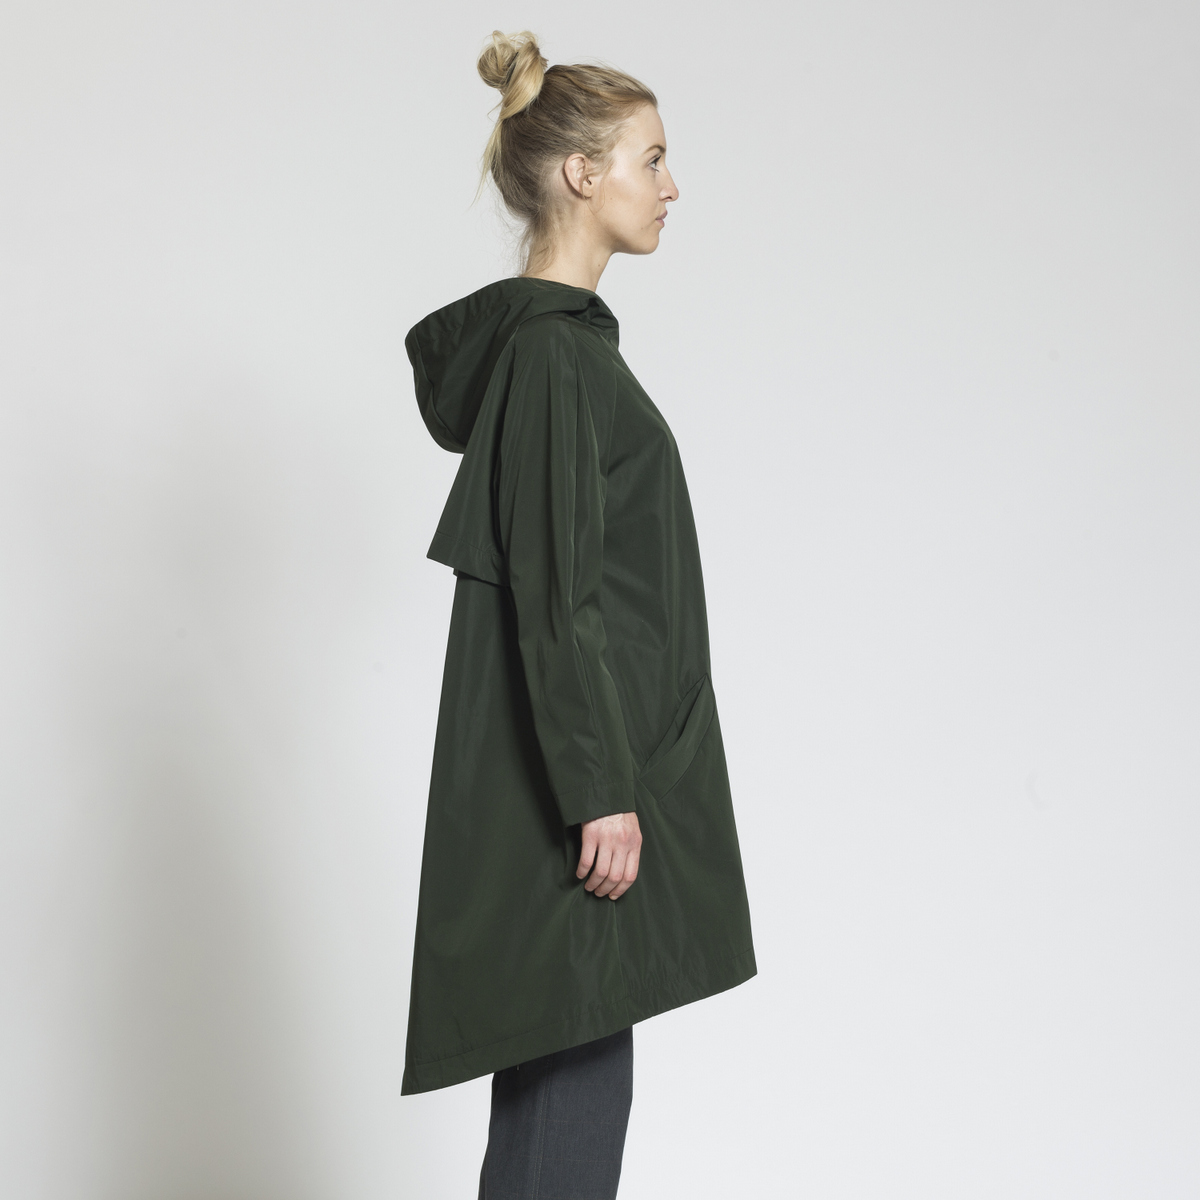 SISTERSCONSPIRACY fashion